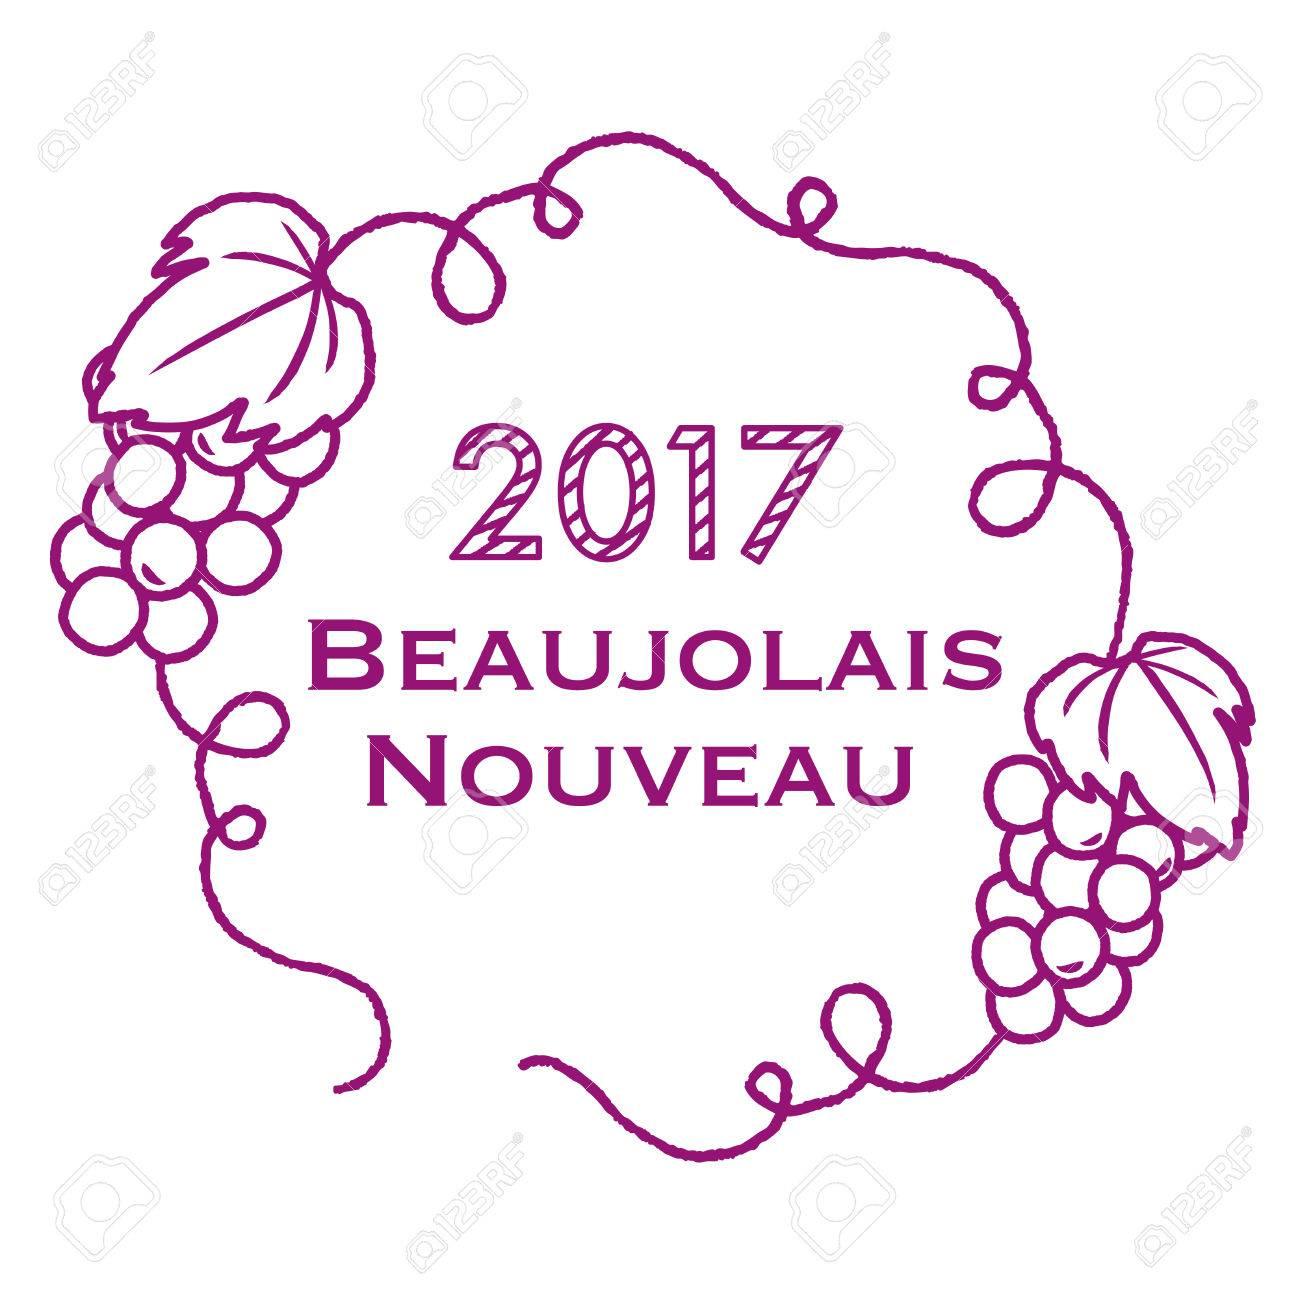 beaujolais nouveau - 83774320